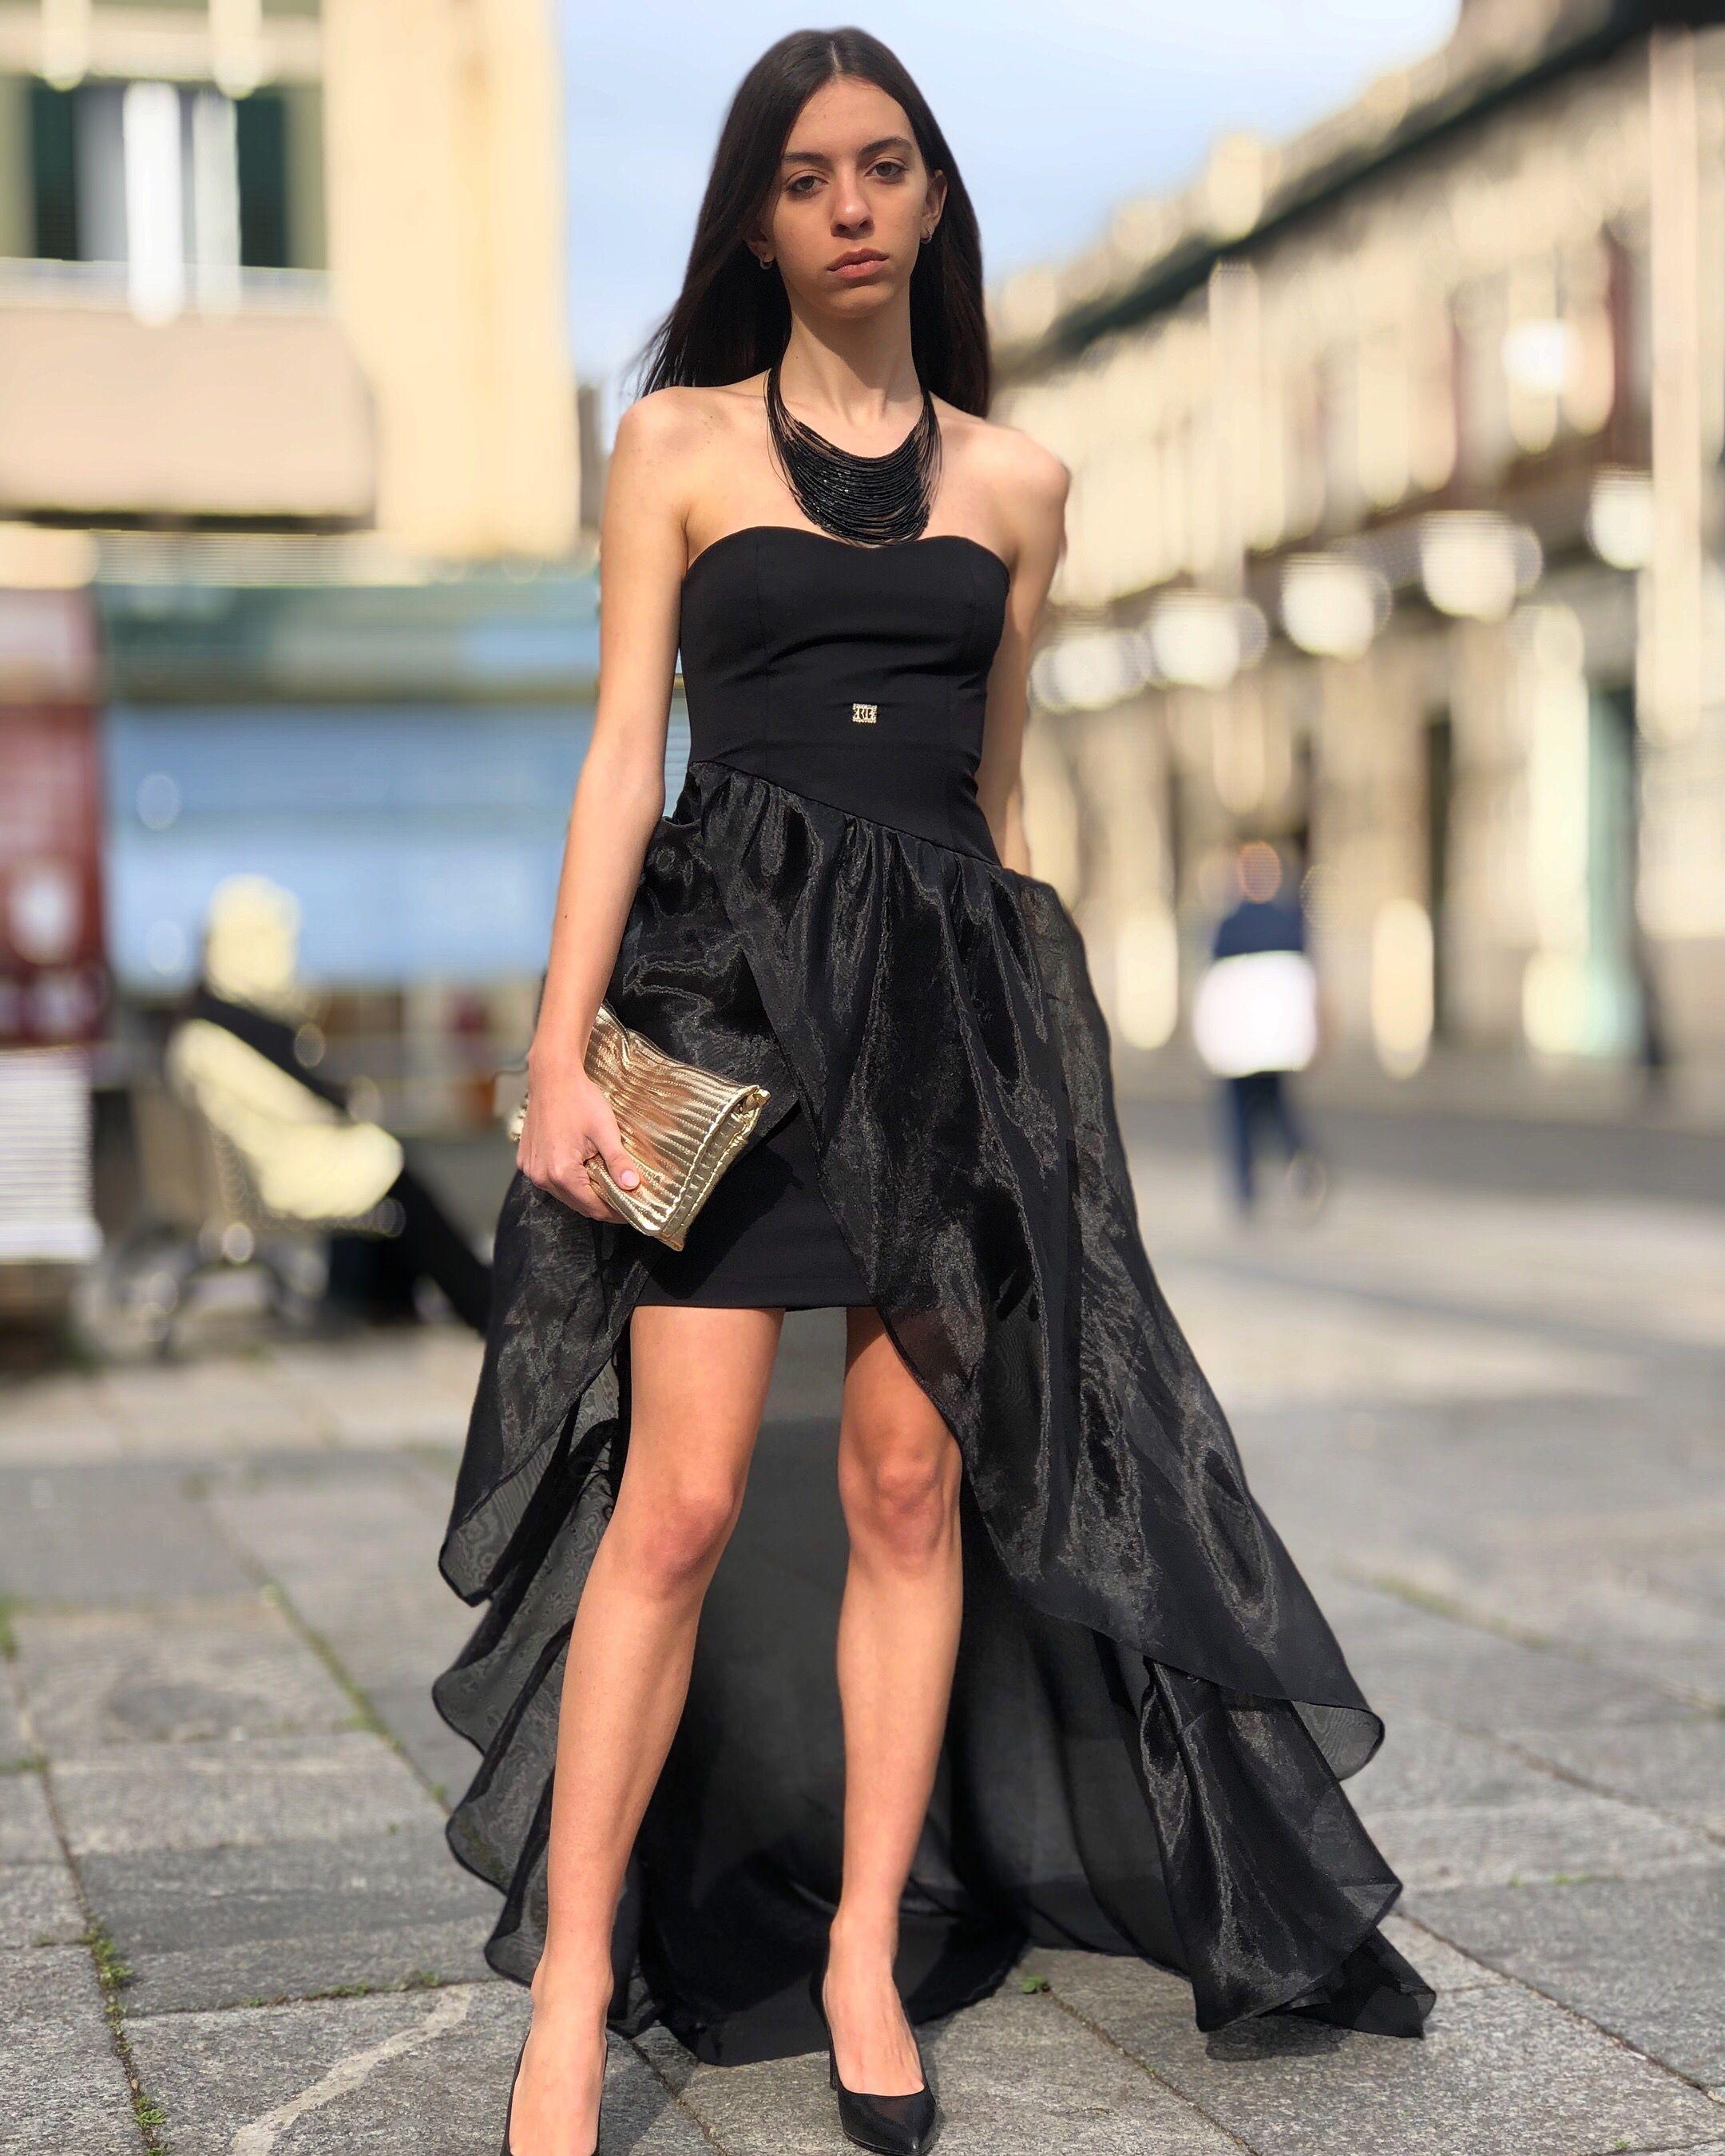 782ba49022e7 Abito Roberta Biagi - Roberta Biagi - Gogolfun.it | Abiti eleganti da  cerimonia nel 2019 | Fashion, Dresses e Style